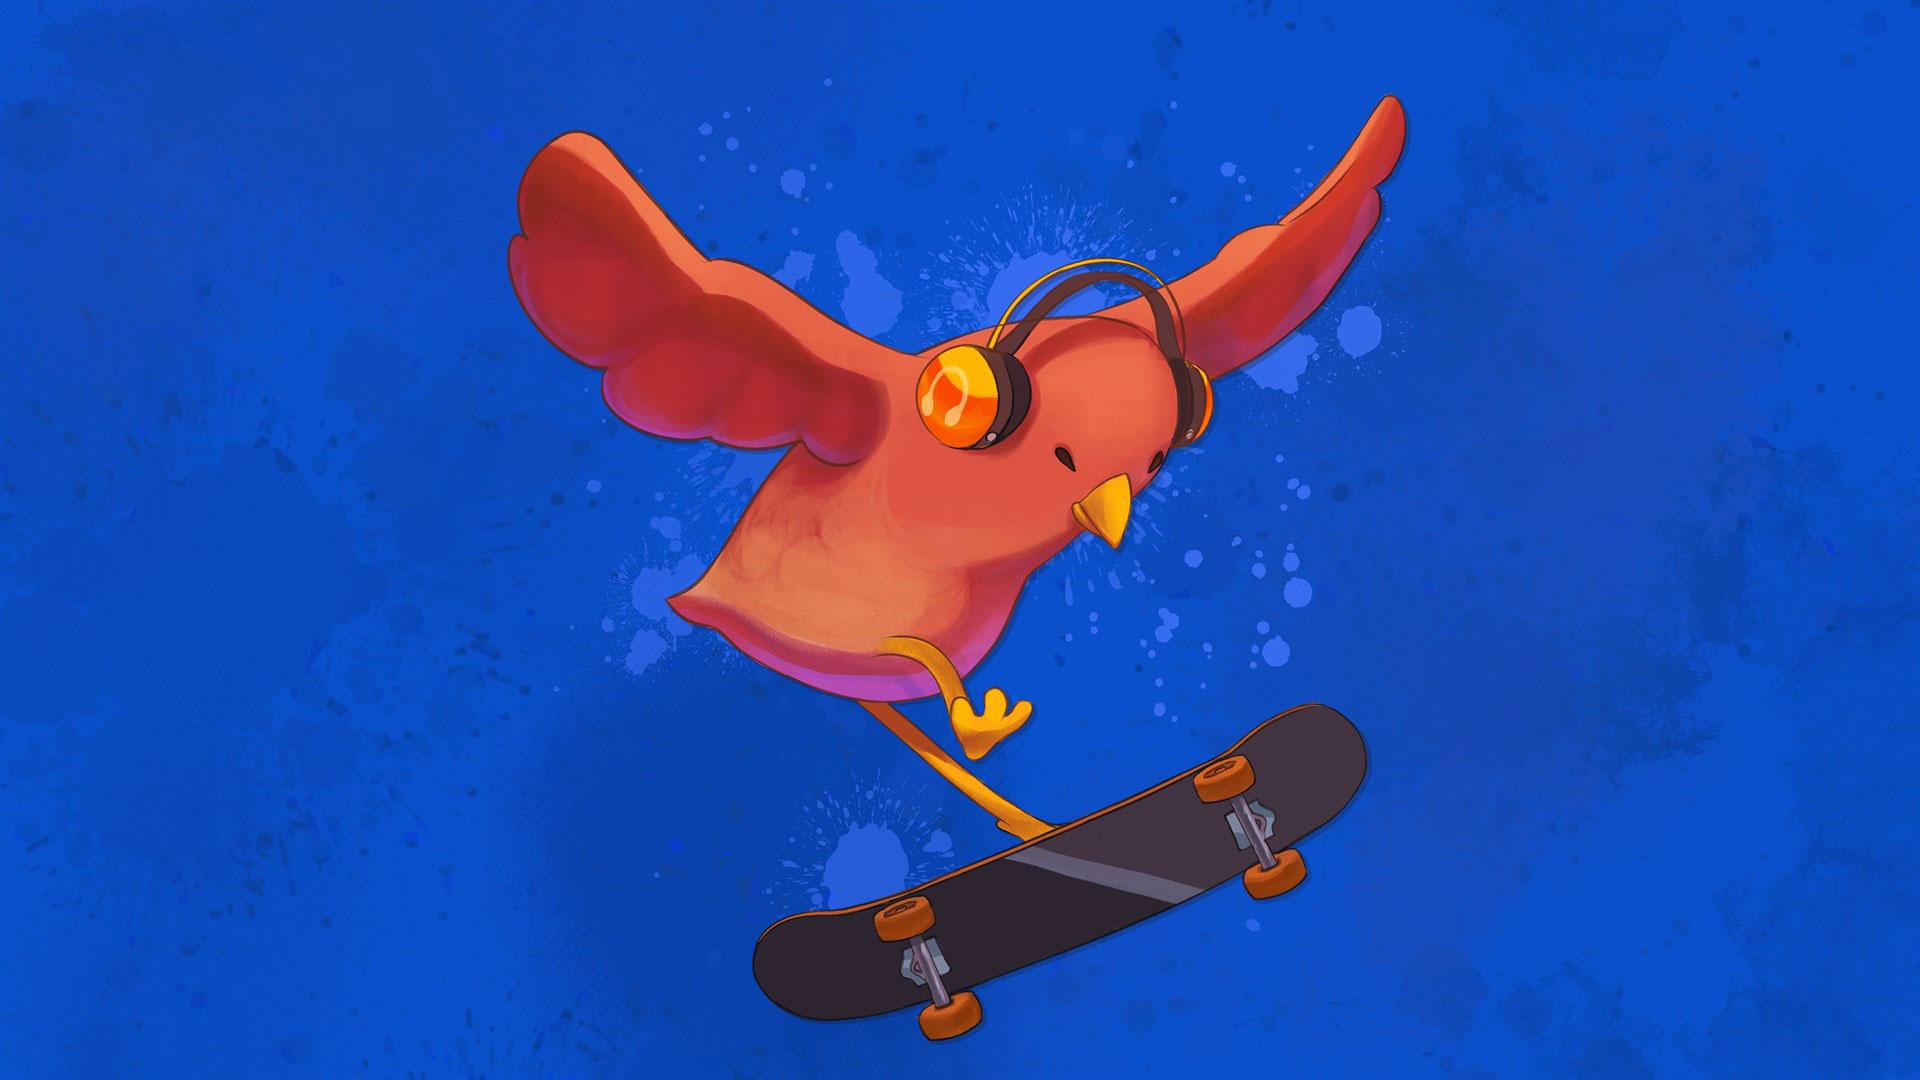 Free Skatebird Wallpaper in 1920x1080